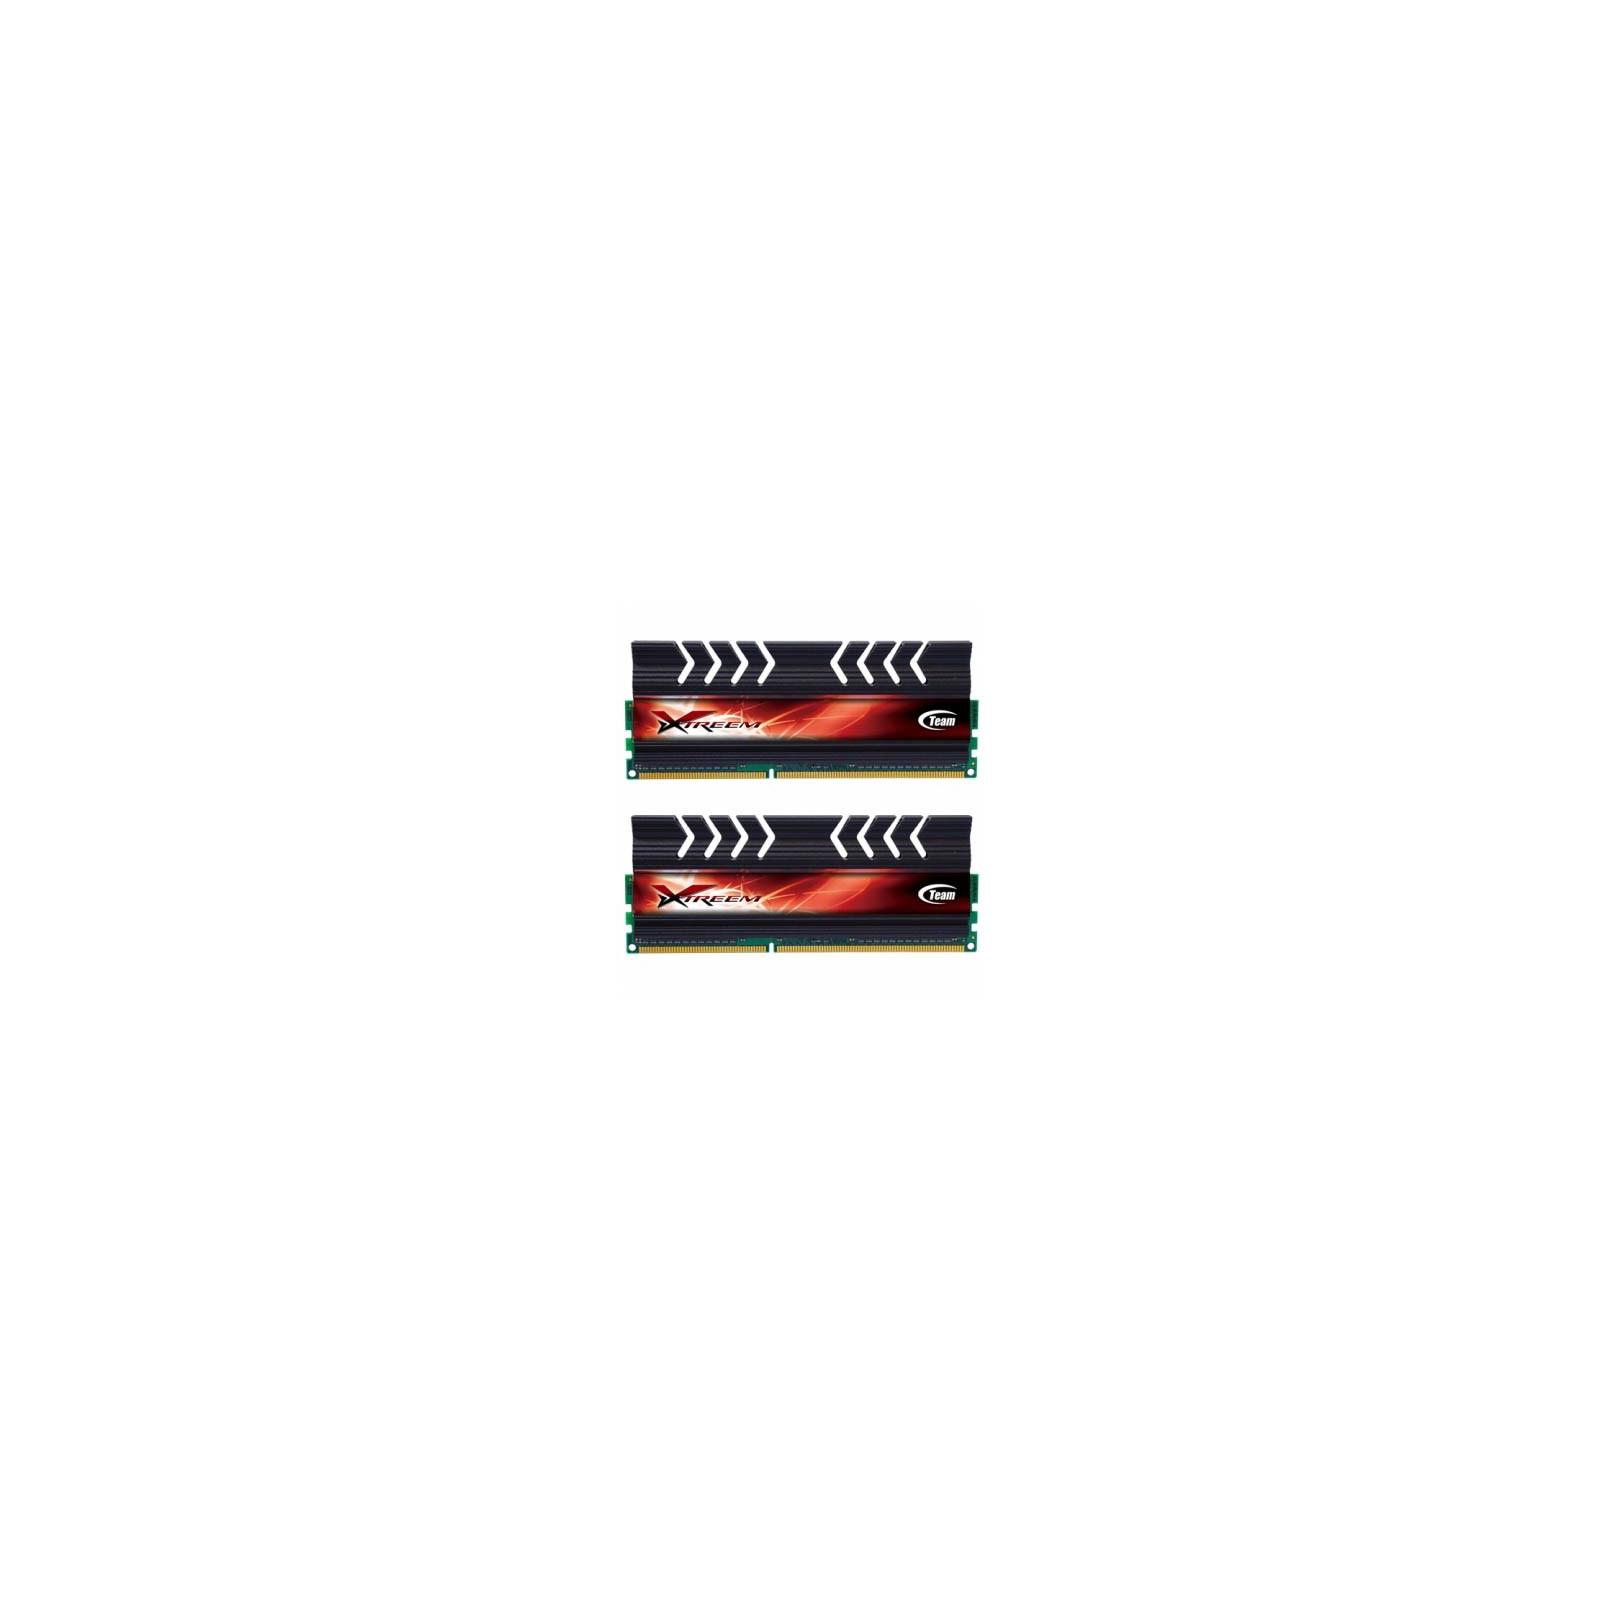 Модуль памяти для компьютера DDR3 8GB (2x4GB) 2600 MHz Team (TXD38G2600HC10QDC01)